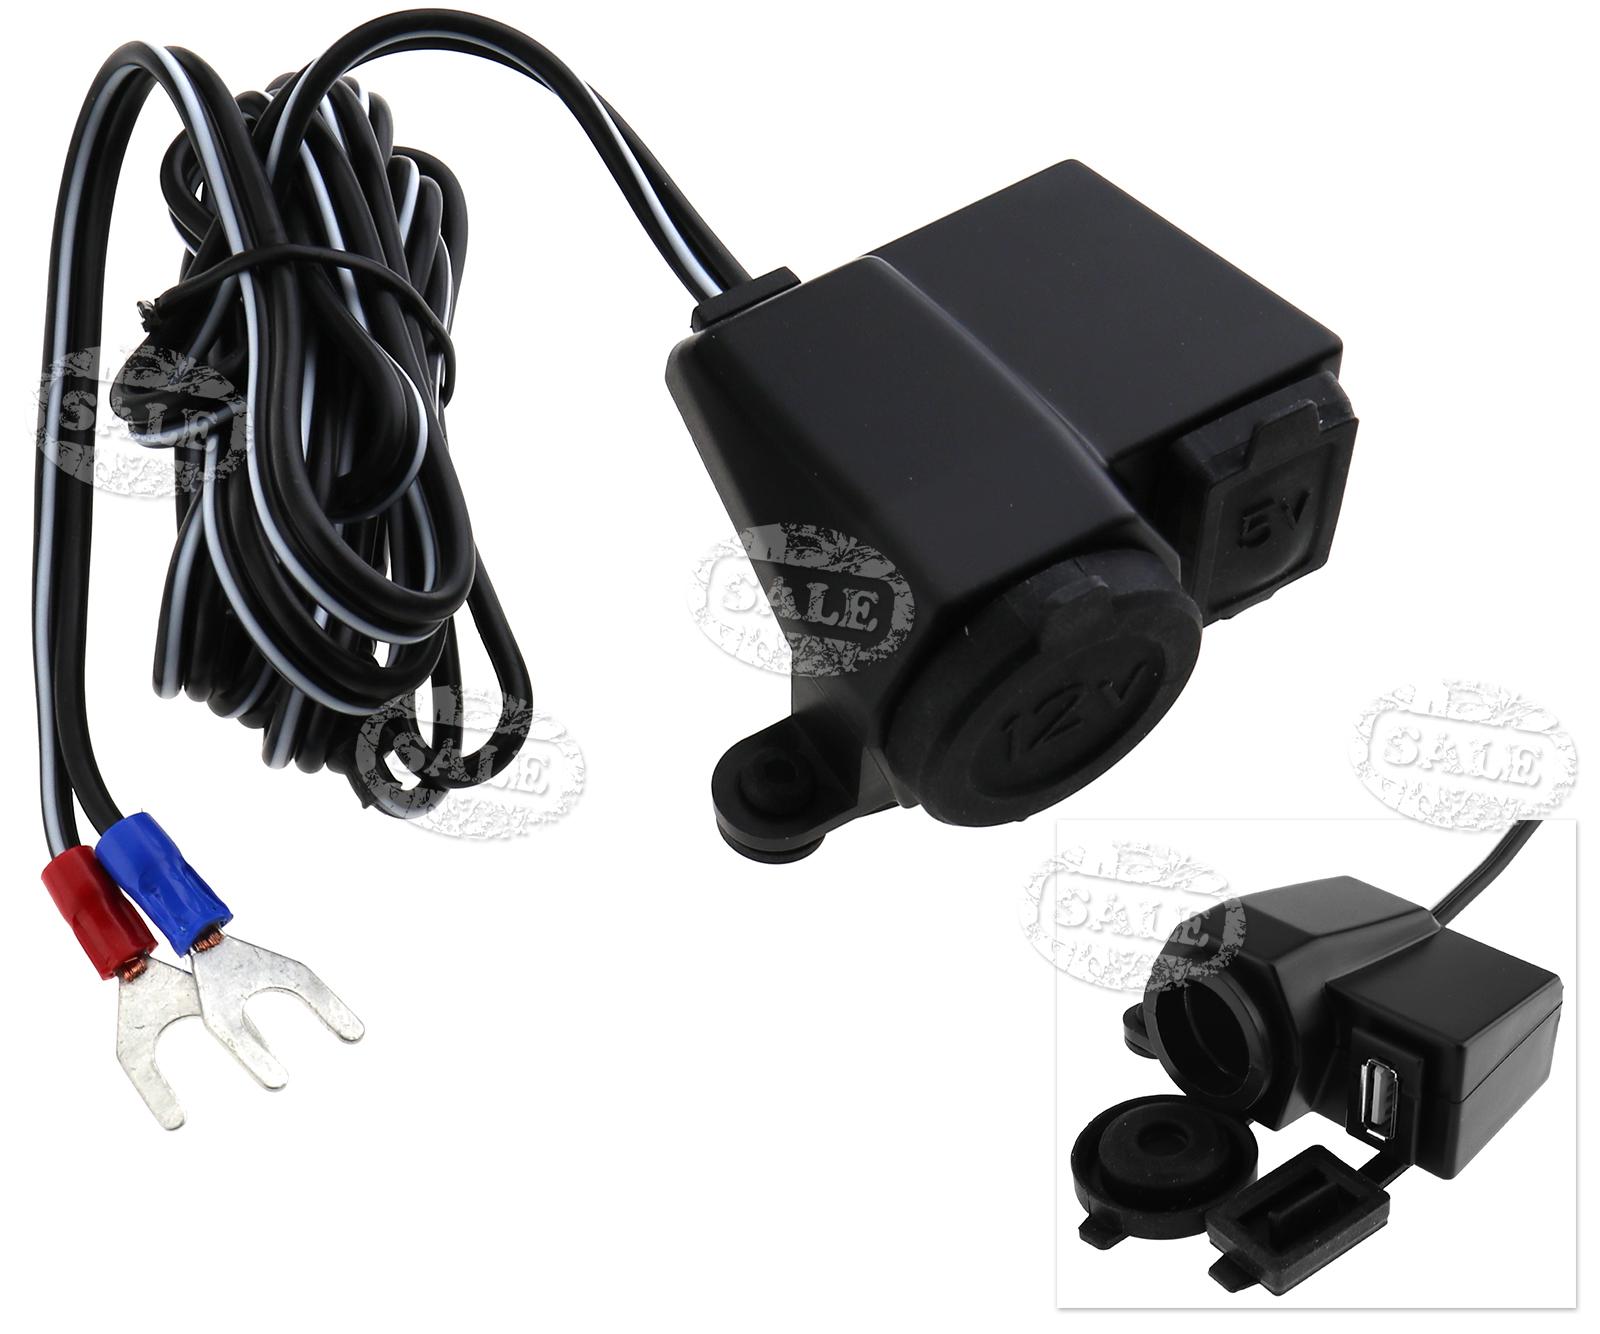 Waterproof usb phone charger v motorbike cigarette